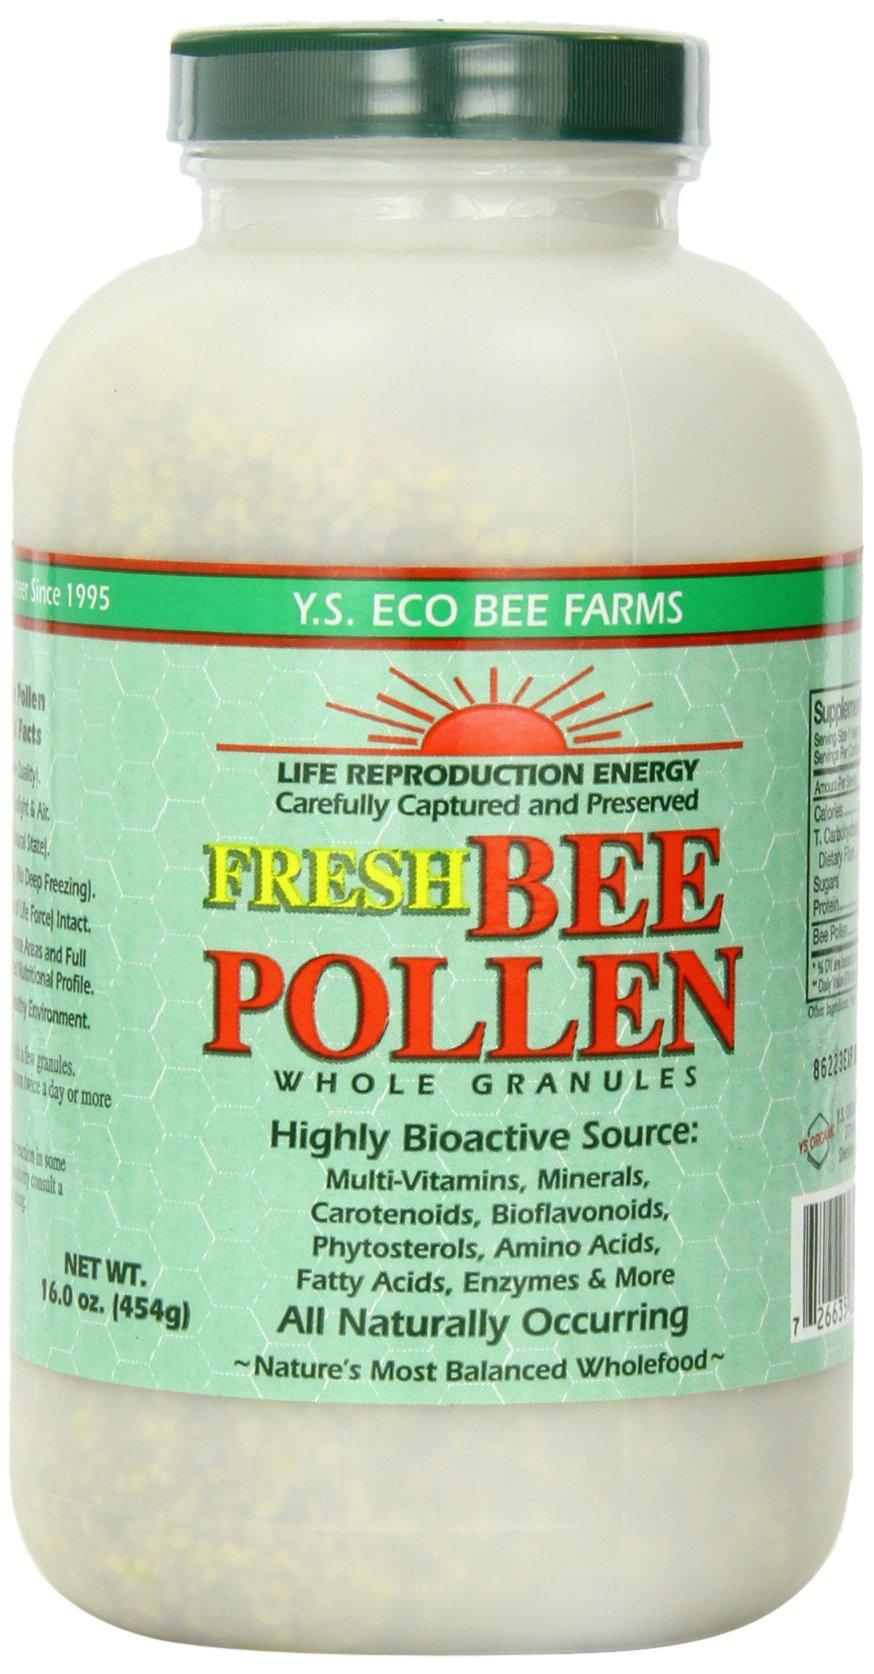 Fresh Bee Pollen Whole Granules - 16 oz. - Granules by Y.S. Organic Bee Farms